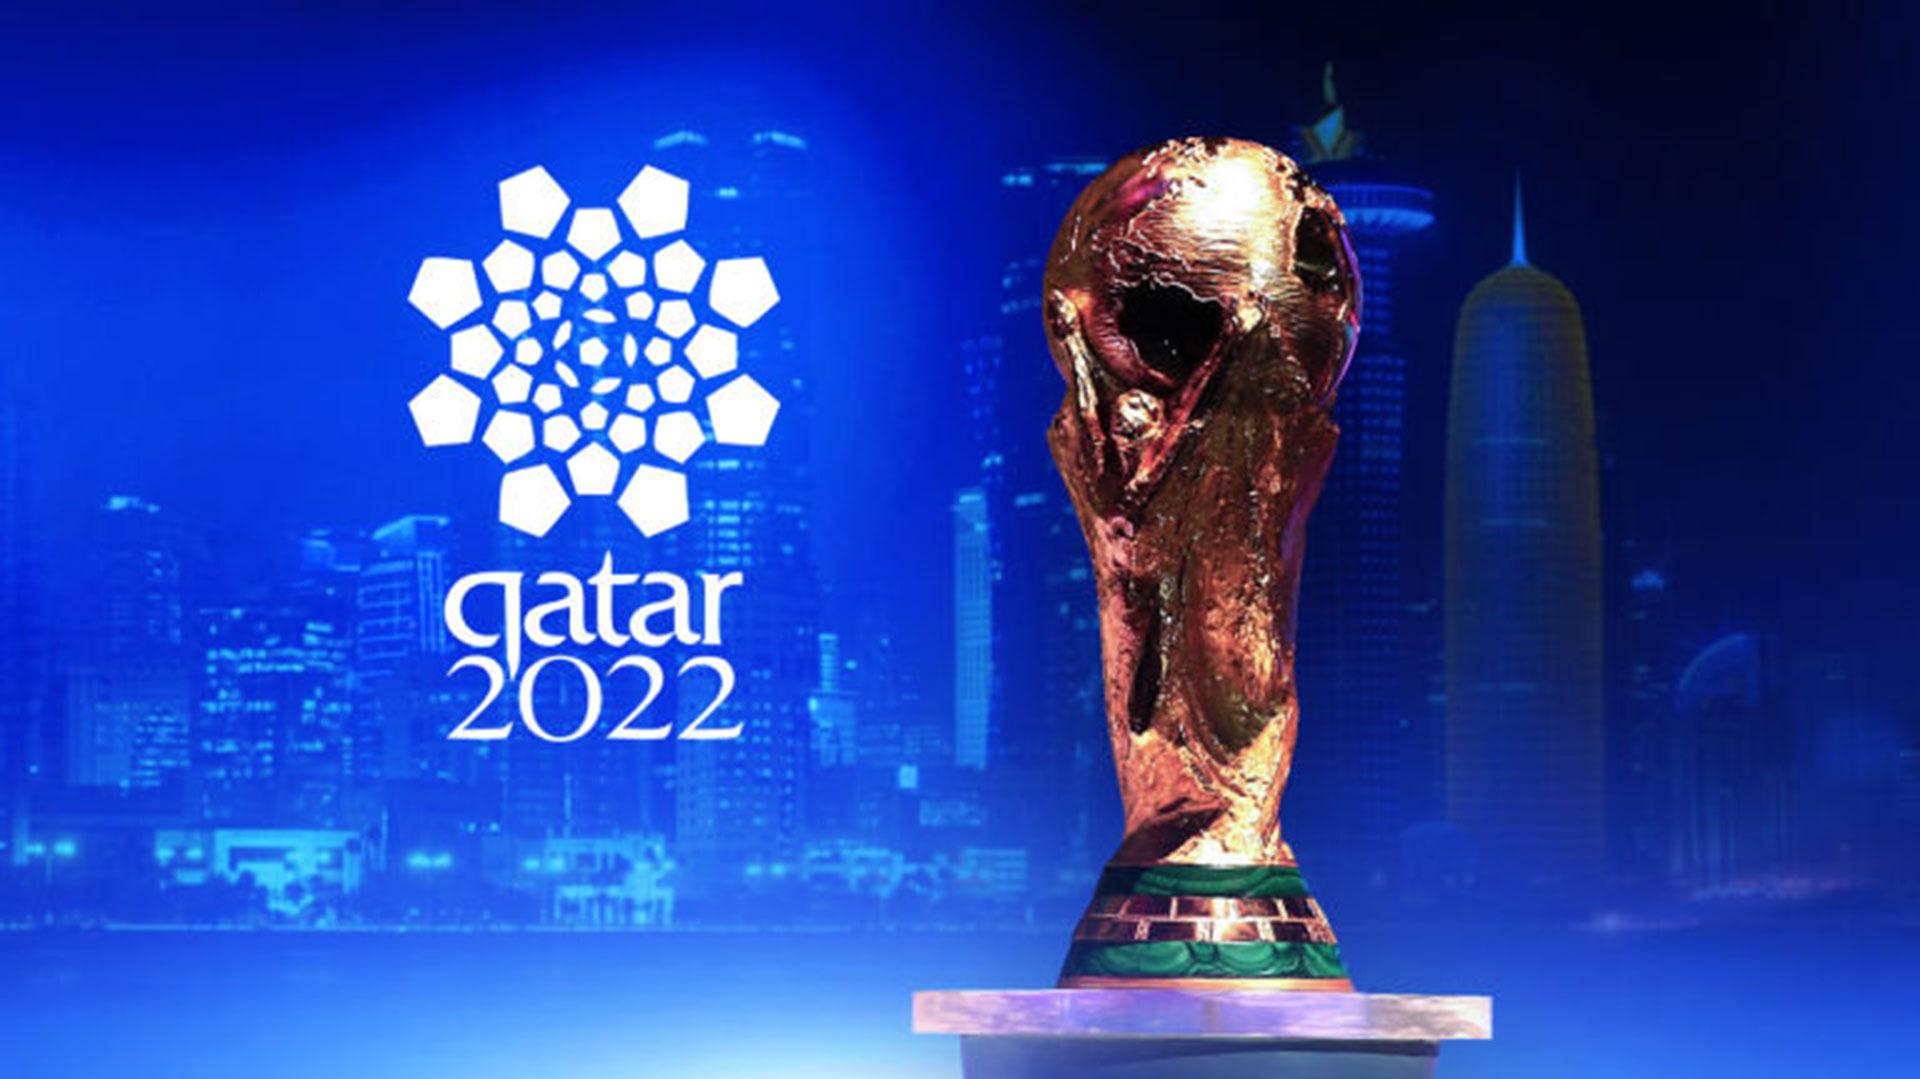 Calendario Eliminatorias Sudamericanas 2020.Las Eliminatorias Rumbo Al Mundial De Qatar 2022 Iniciaran